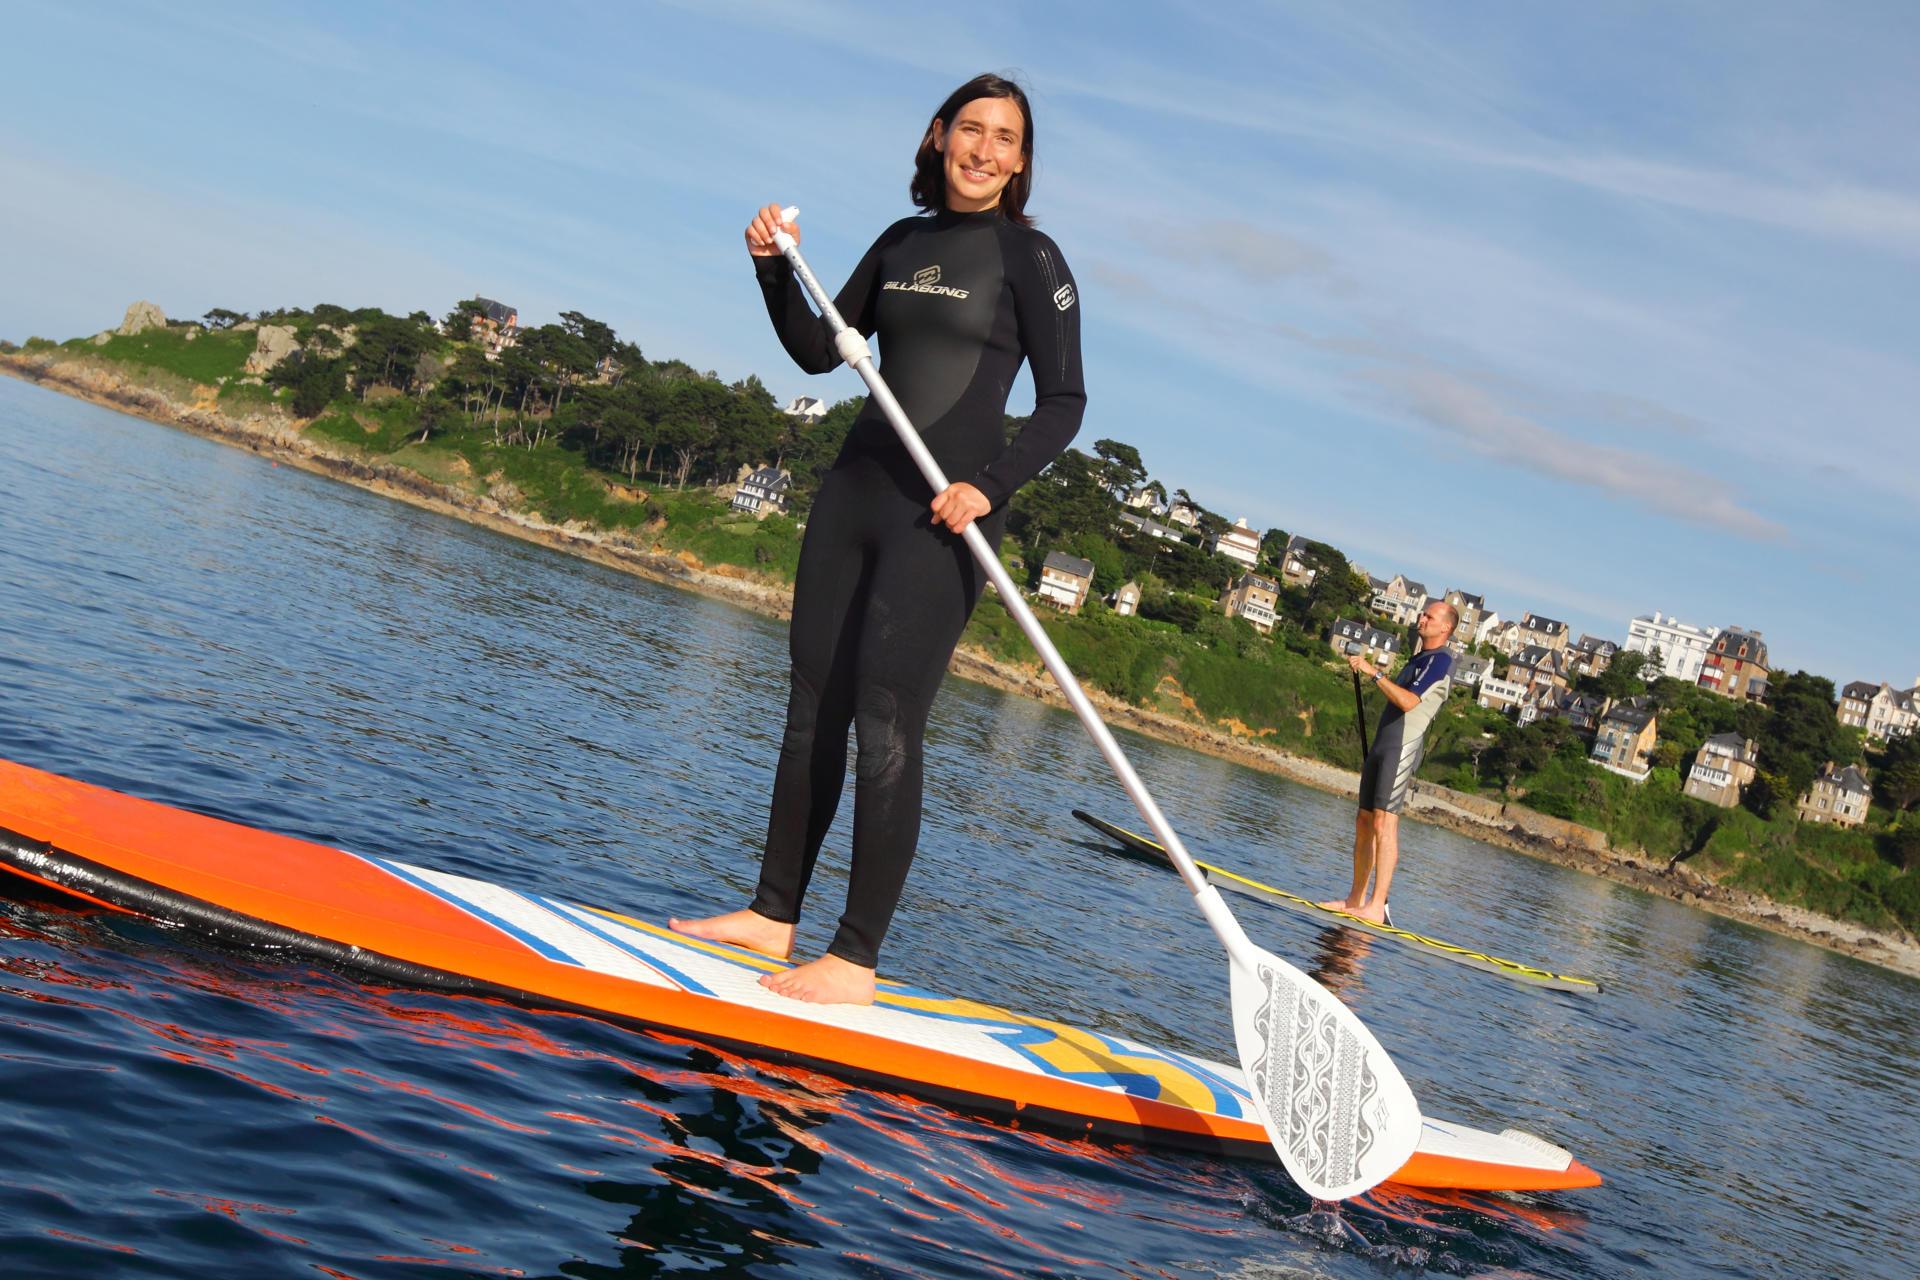 Stand Up Paddle Boarding KM Hawaii STYLE! | Standup paddle